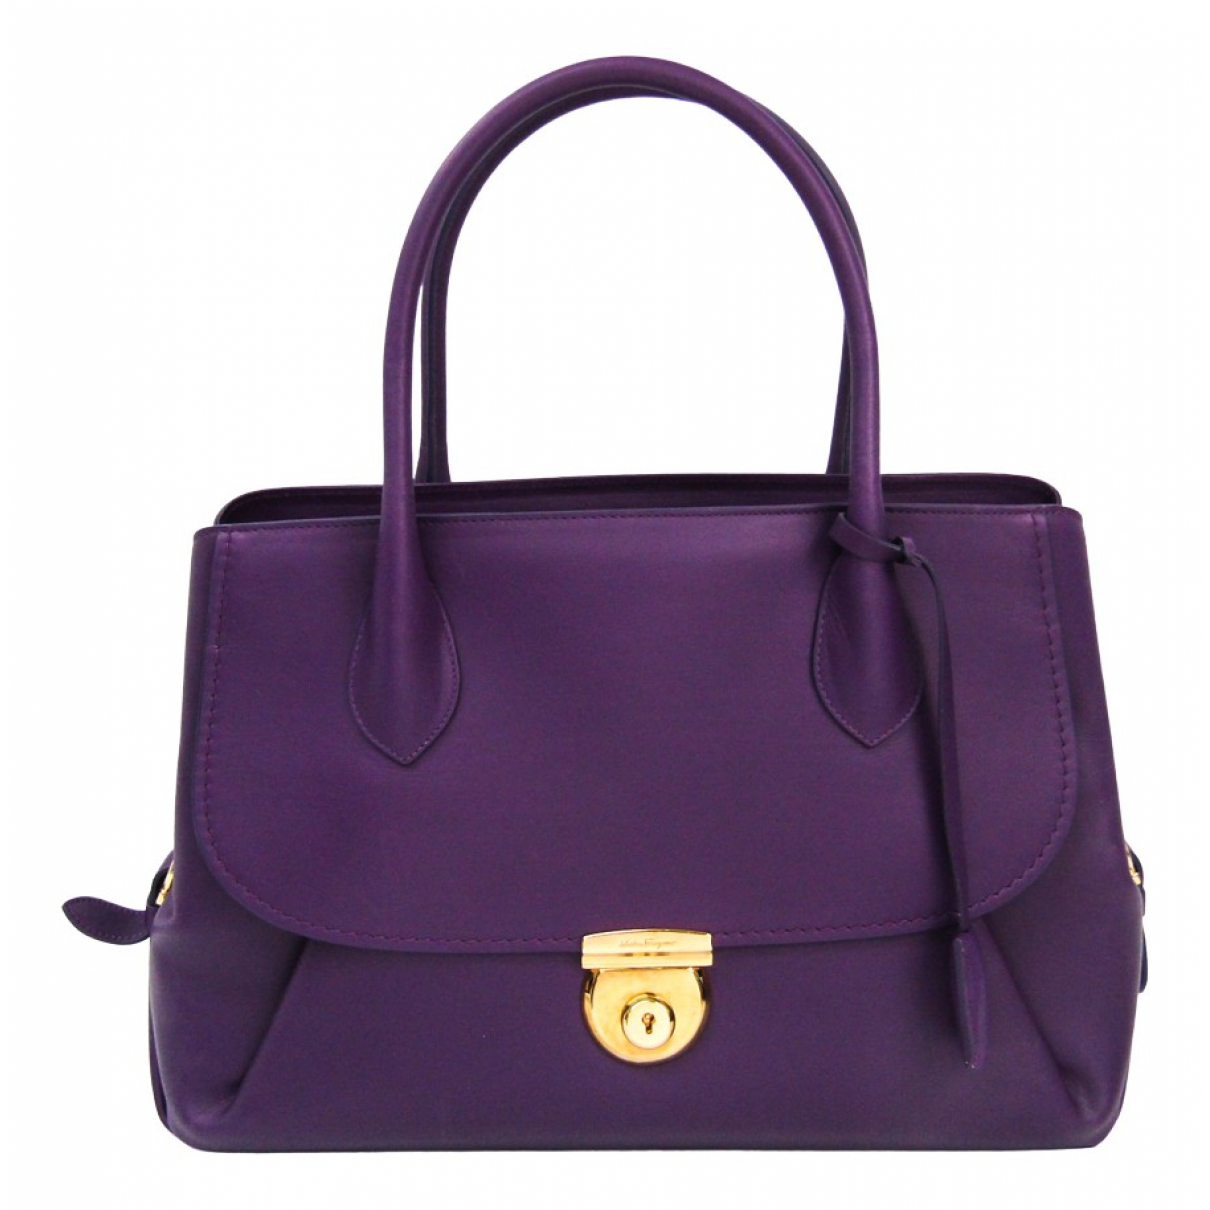 Salvatore Ferragamo N Purple Leather handbag for Women N